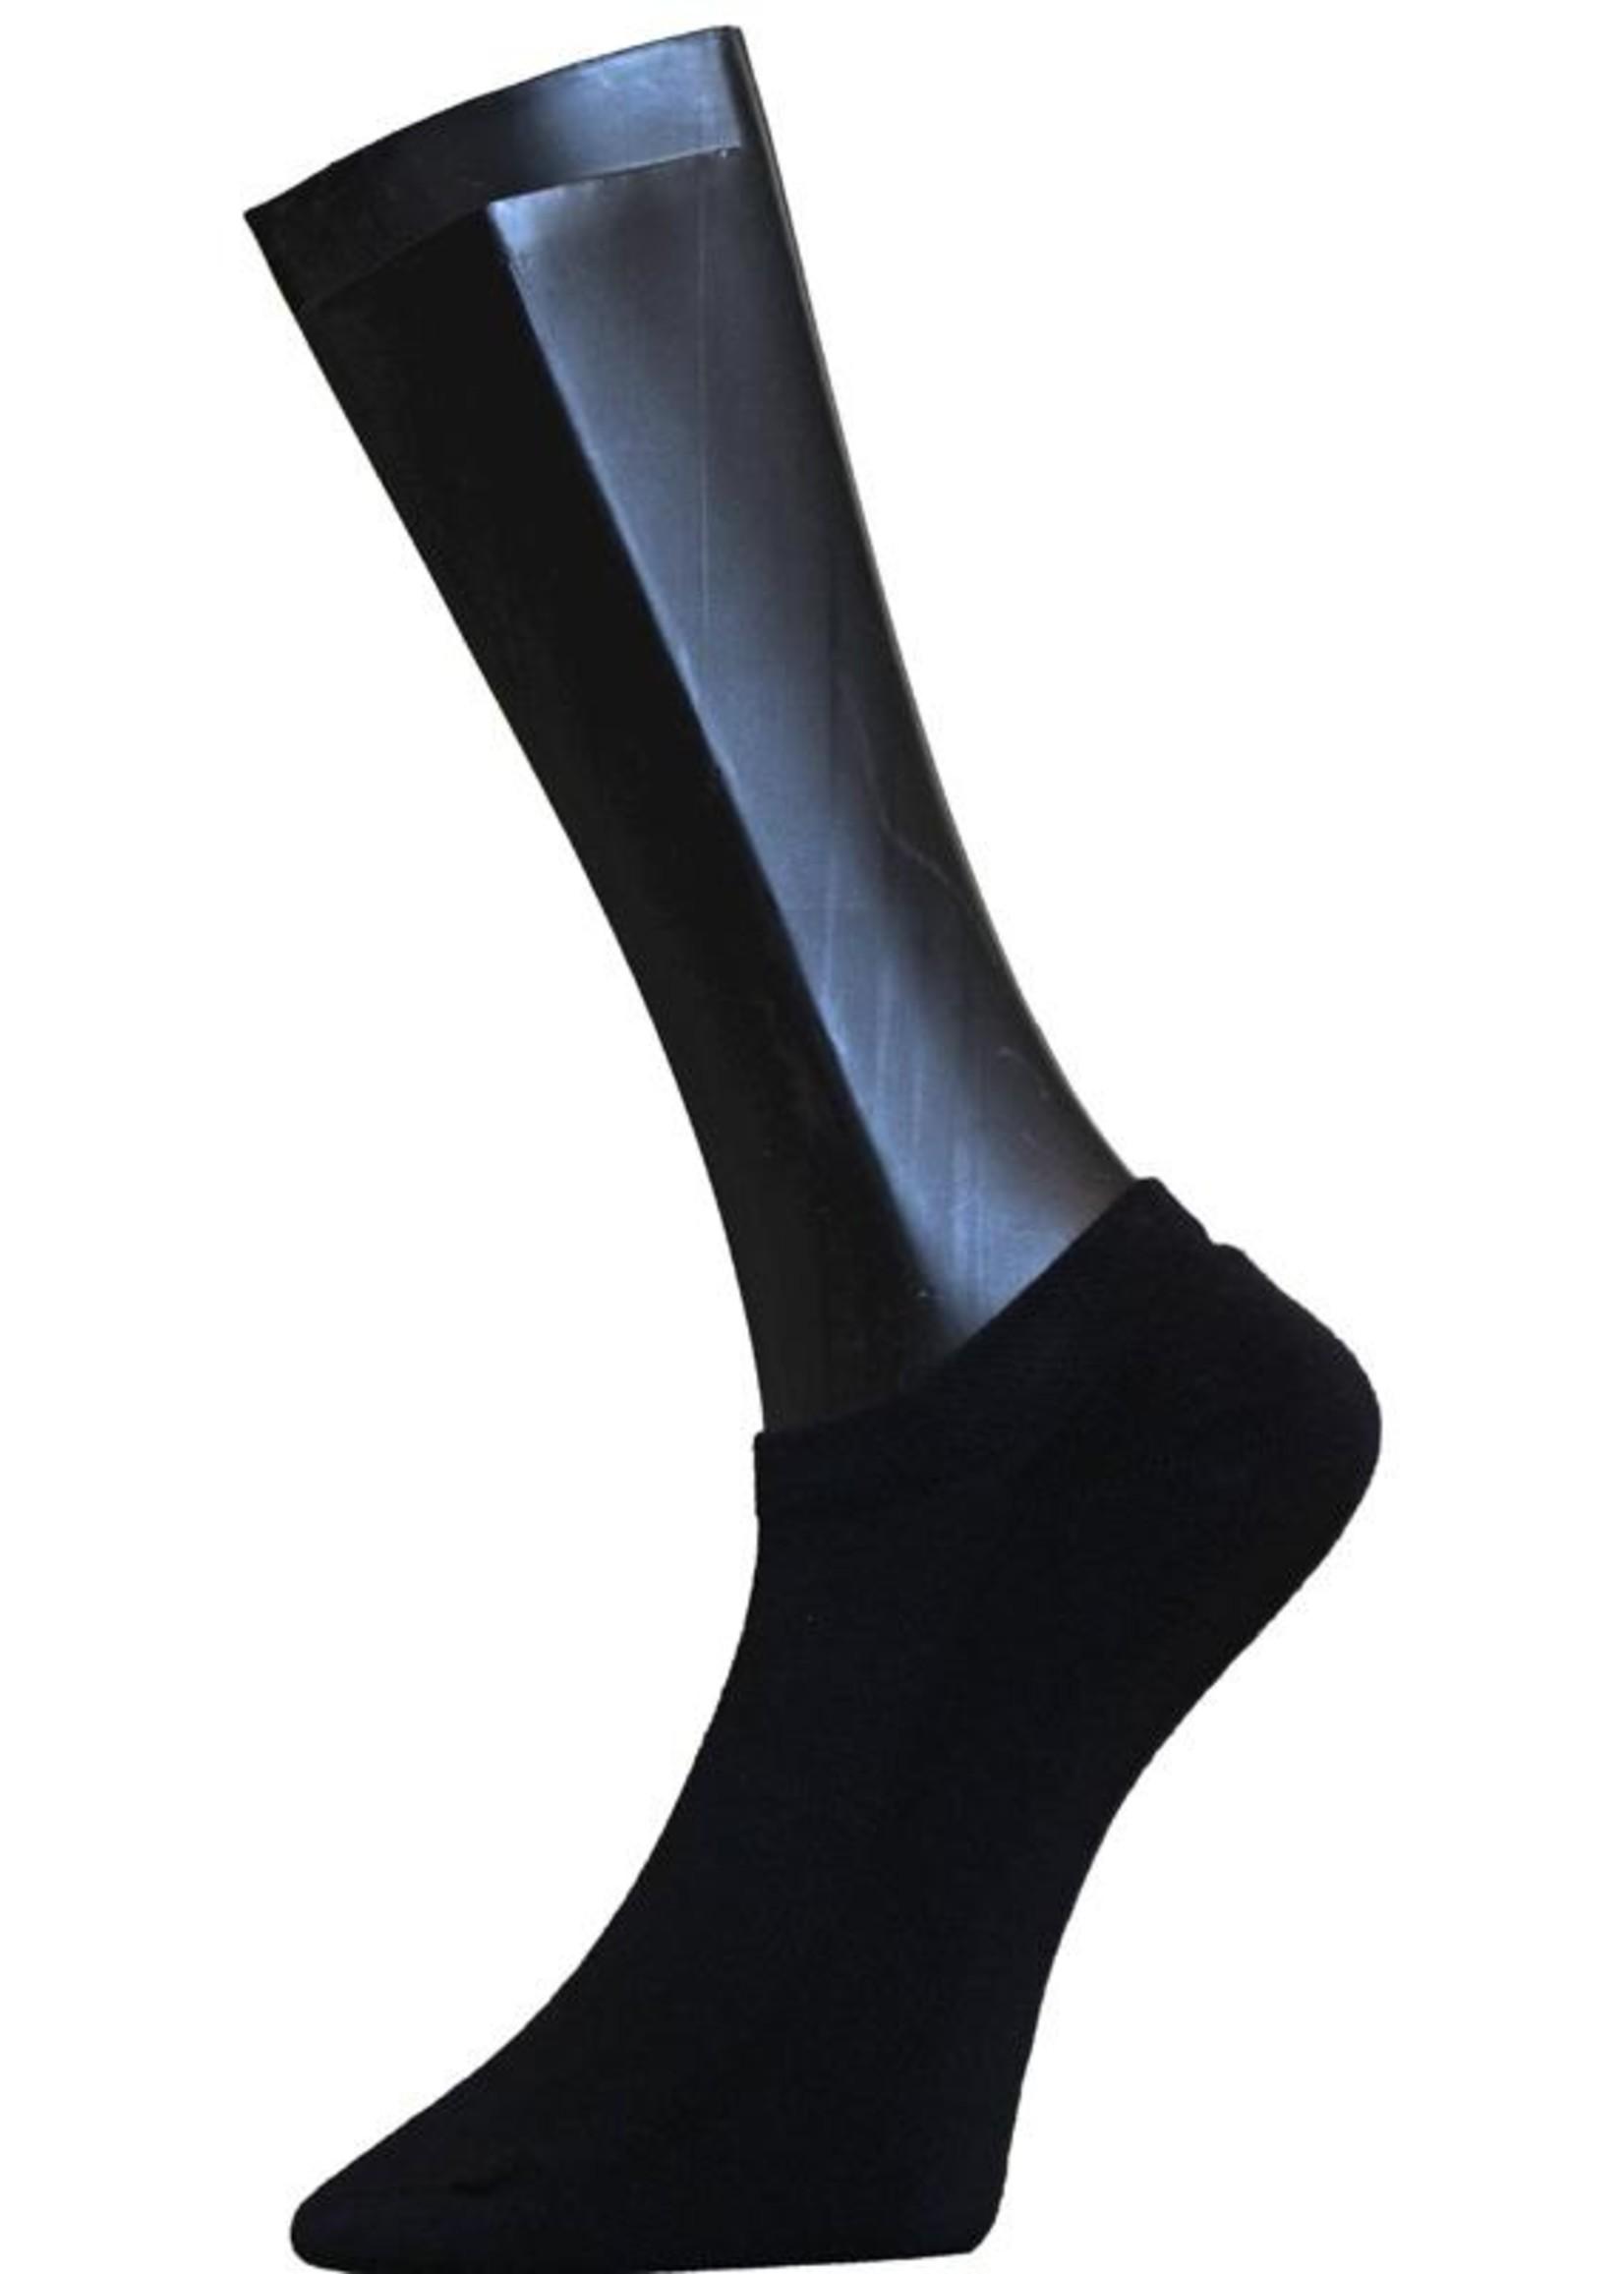 Sneaker badstofzool - Zwart (2 paar)